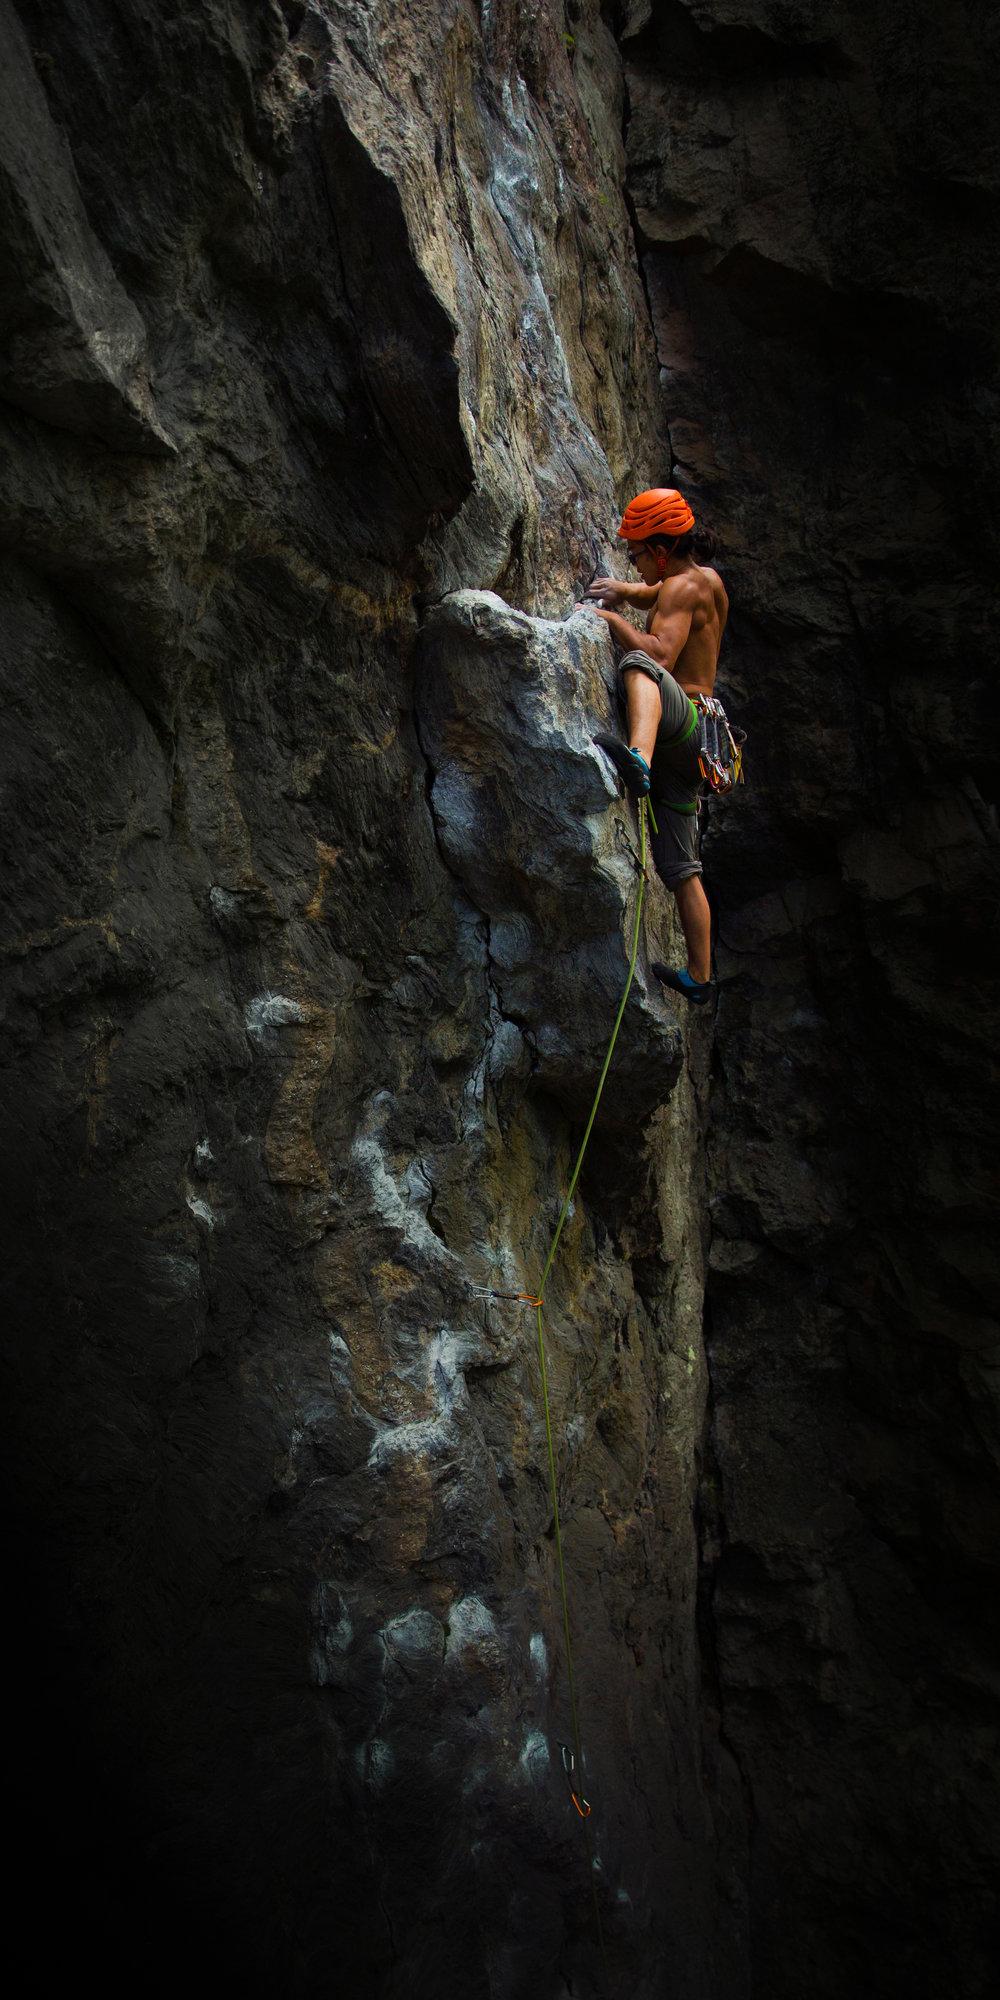 2015_08_26_SD_rumney_climbing_5d_028.jpg